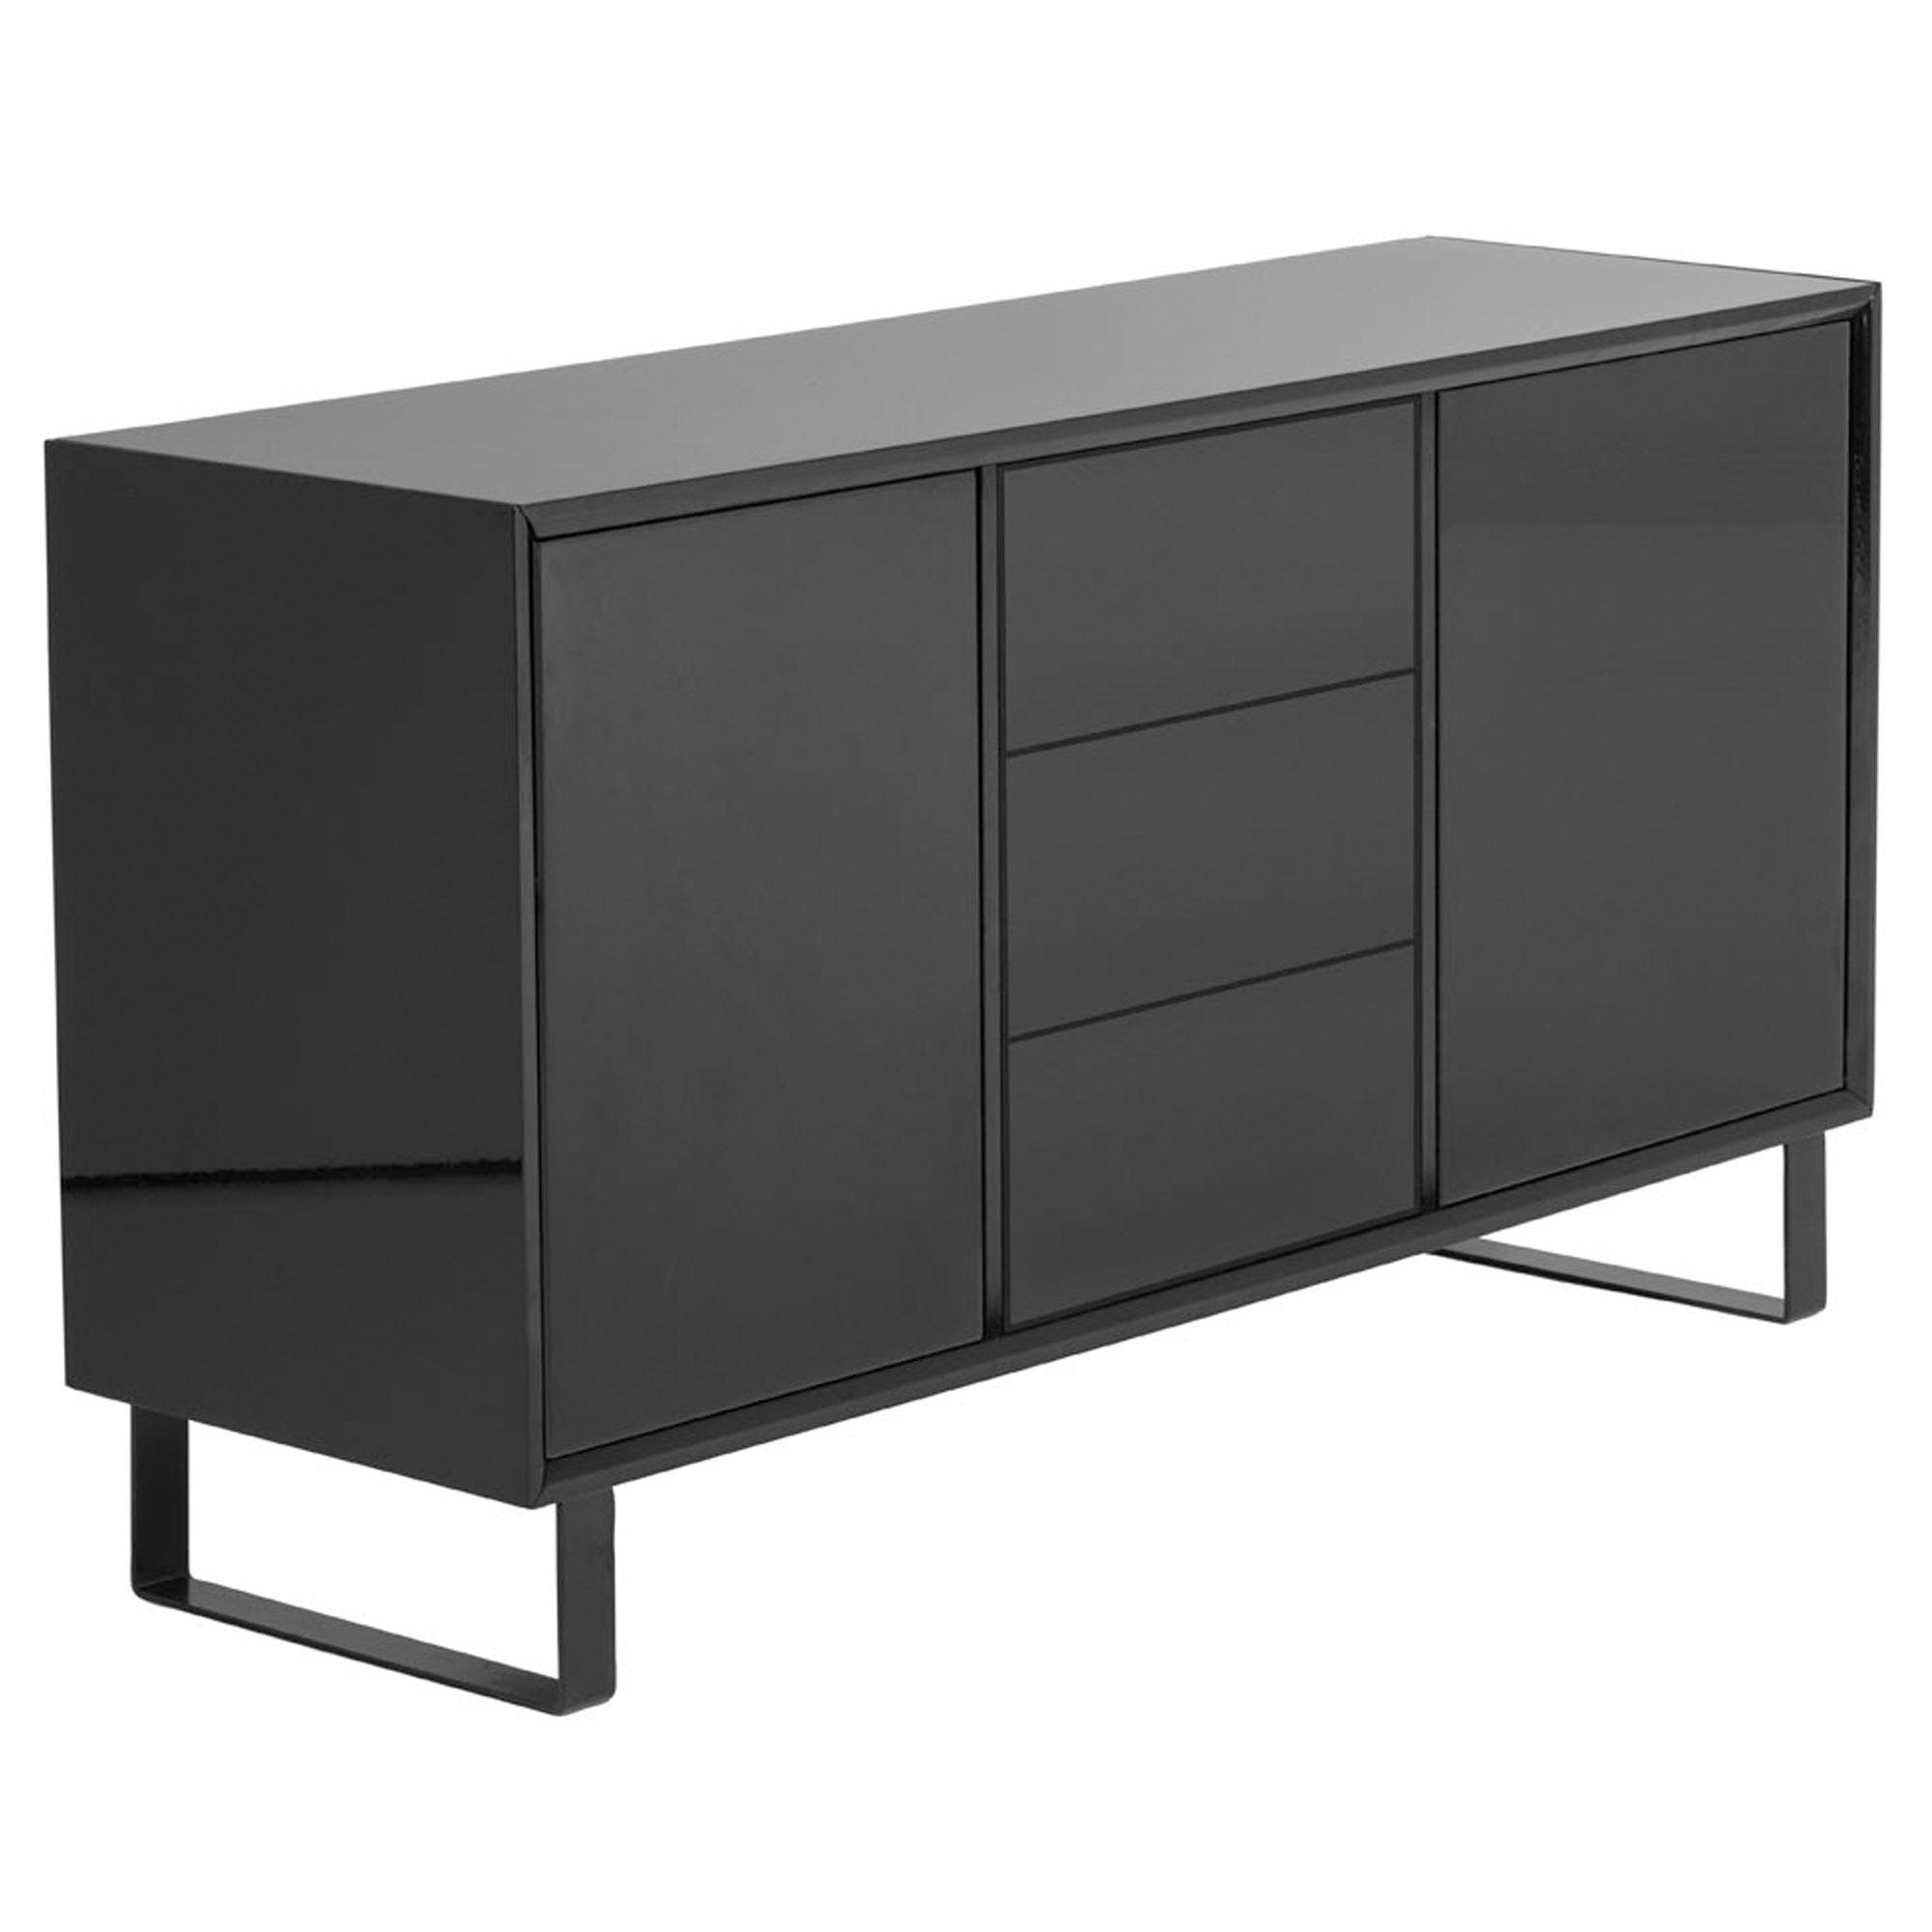 Black Sideboard Modern Contemporary Furniture